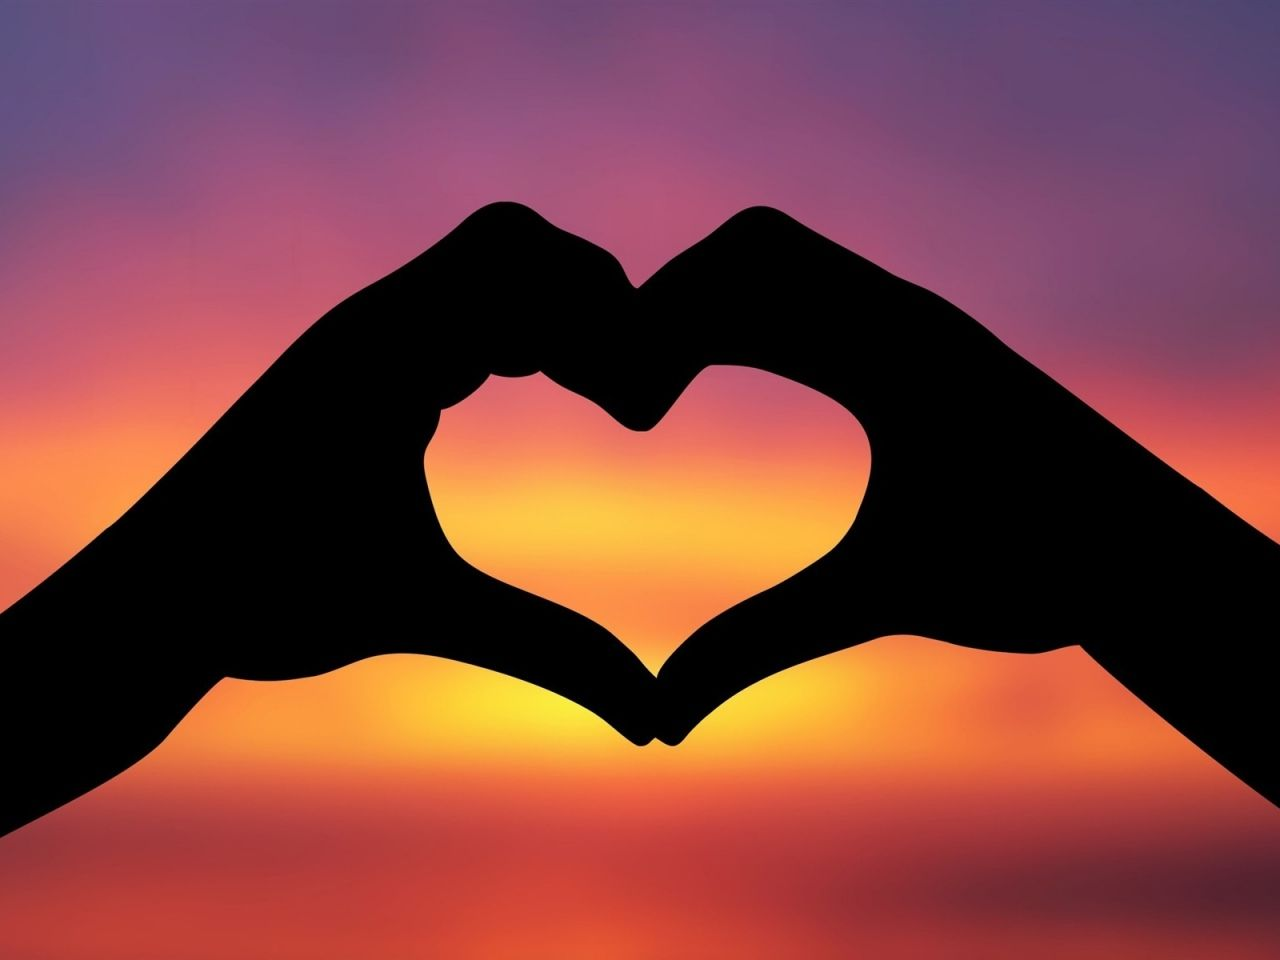 Laska Obrazky Tapety Srdce Ruce Vektoru Obloha Pozadi Silueta